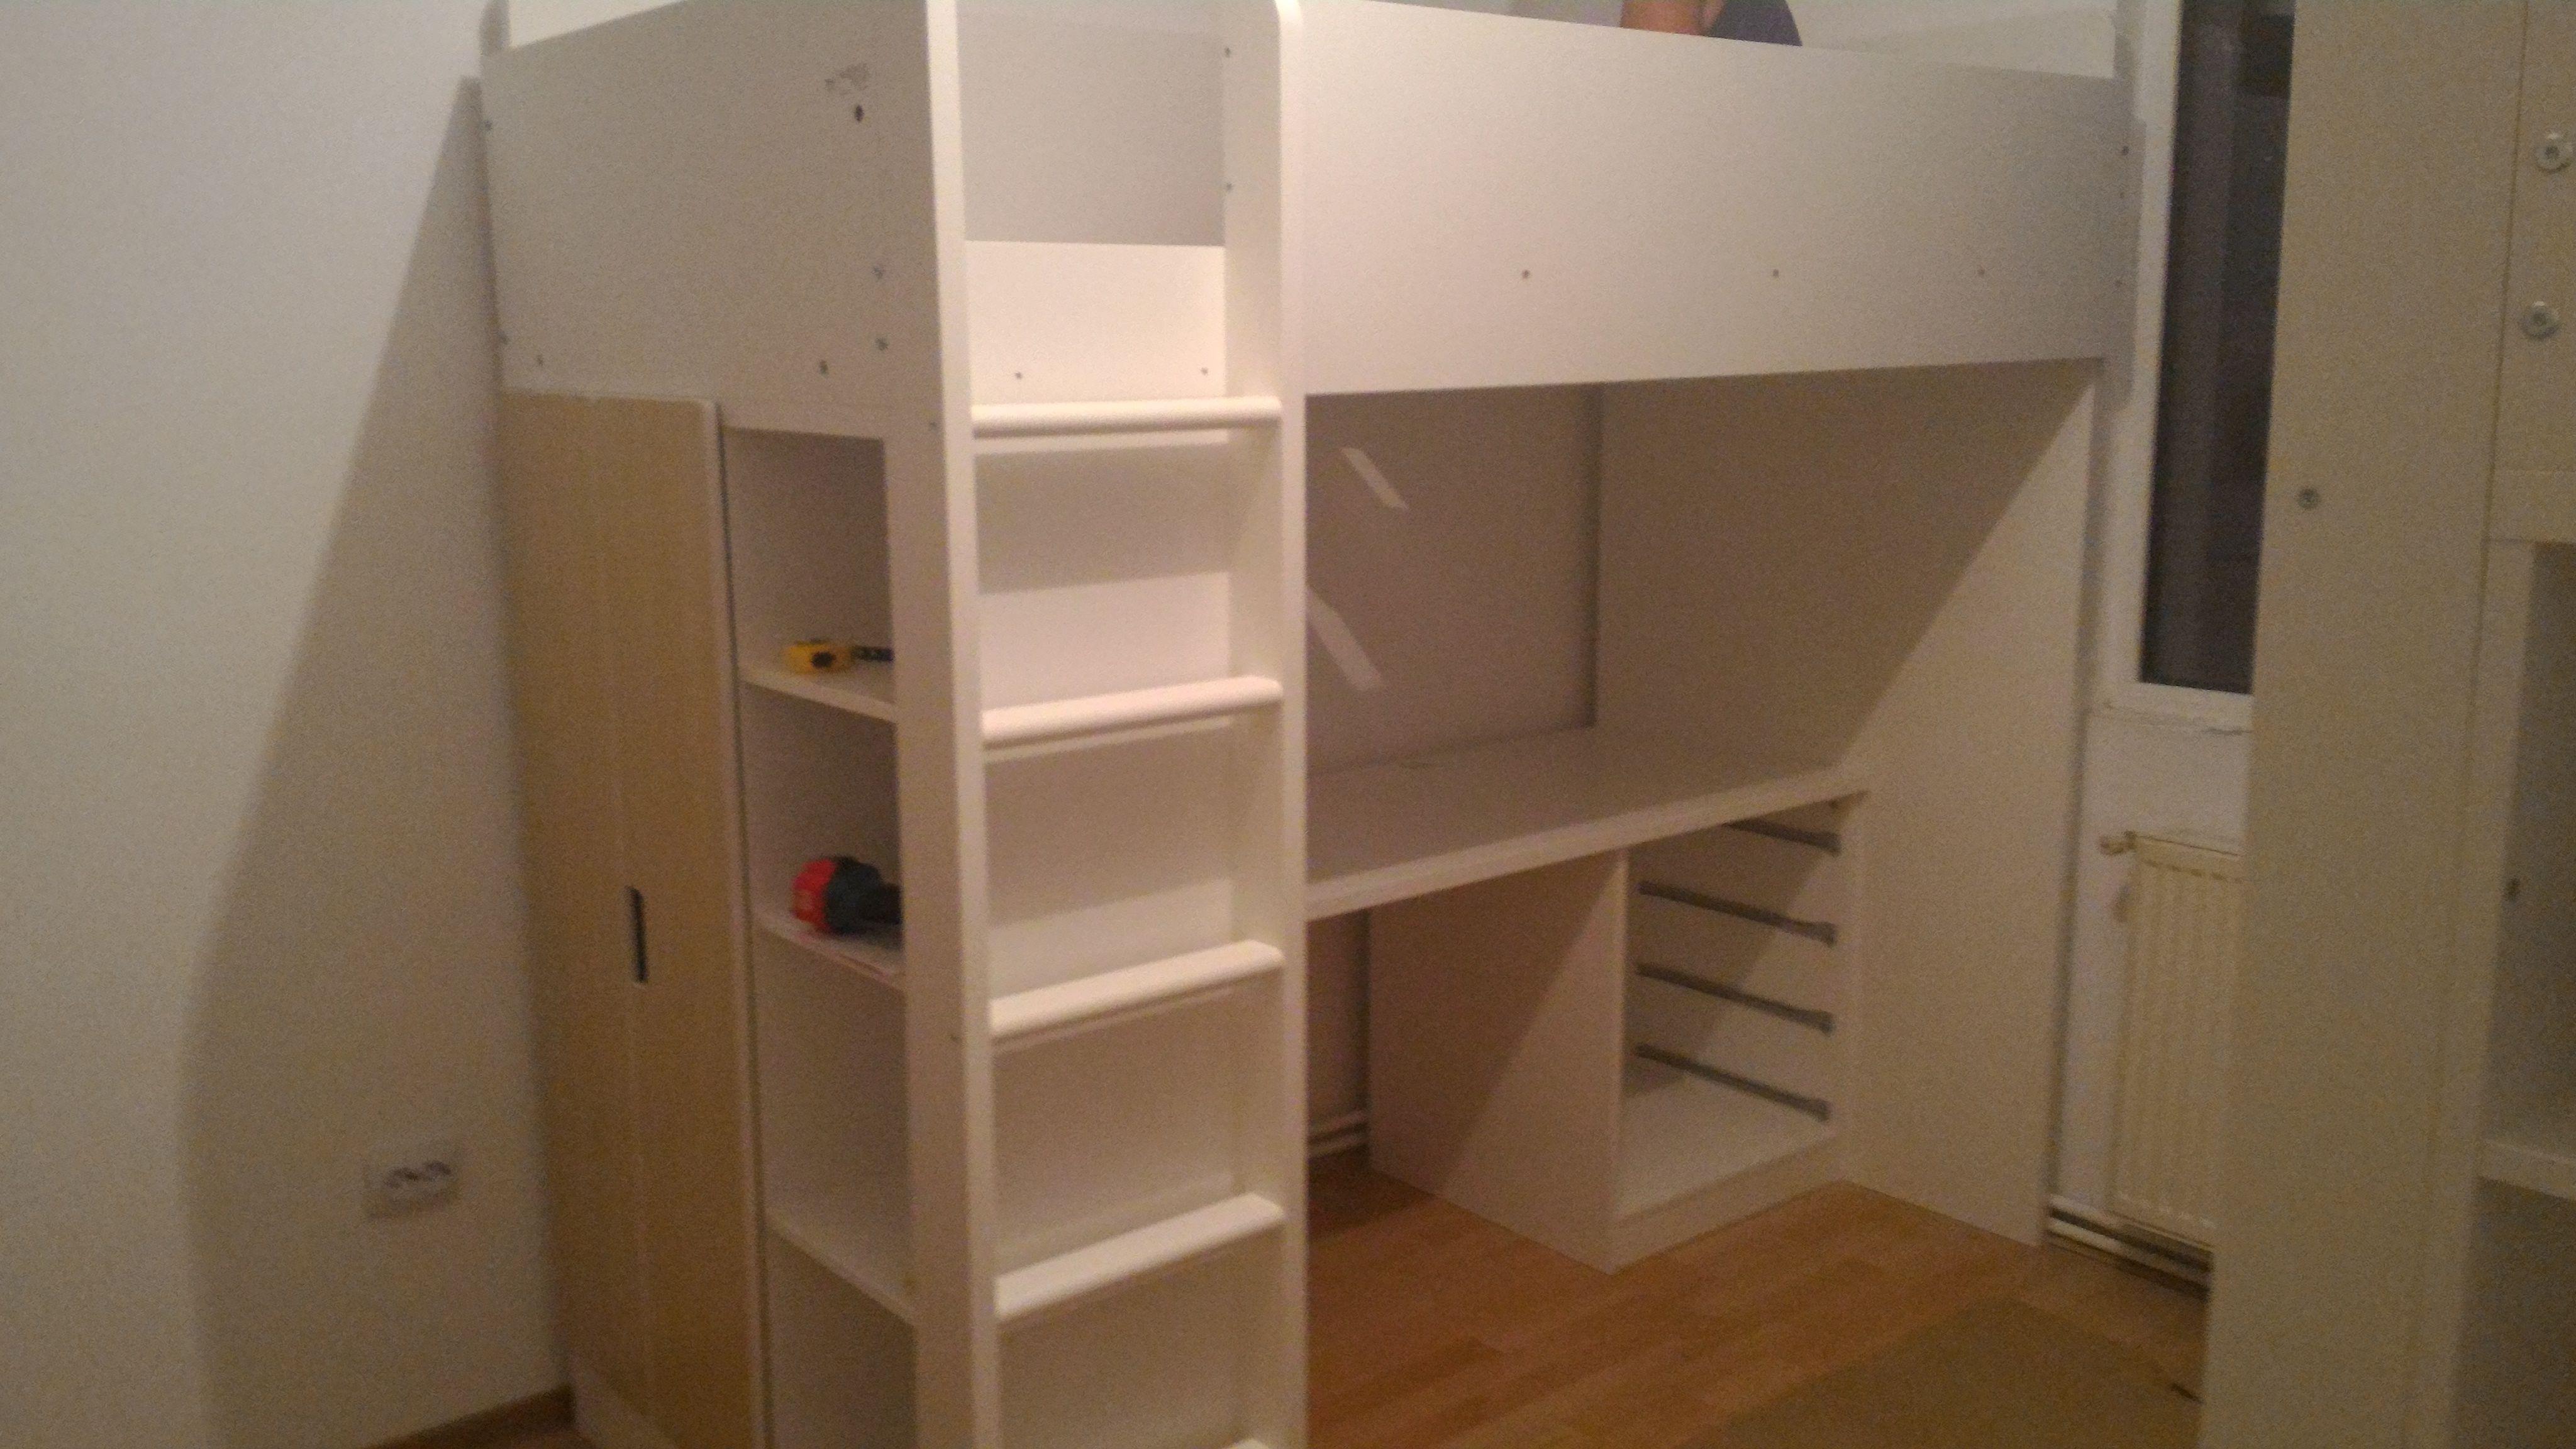 mirroring an ikea loft bed stuva ideas for the house pinterest hochbetten. Black Bedroom Furniture Sets. Home Design Ideas